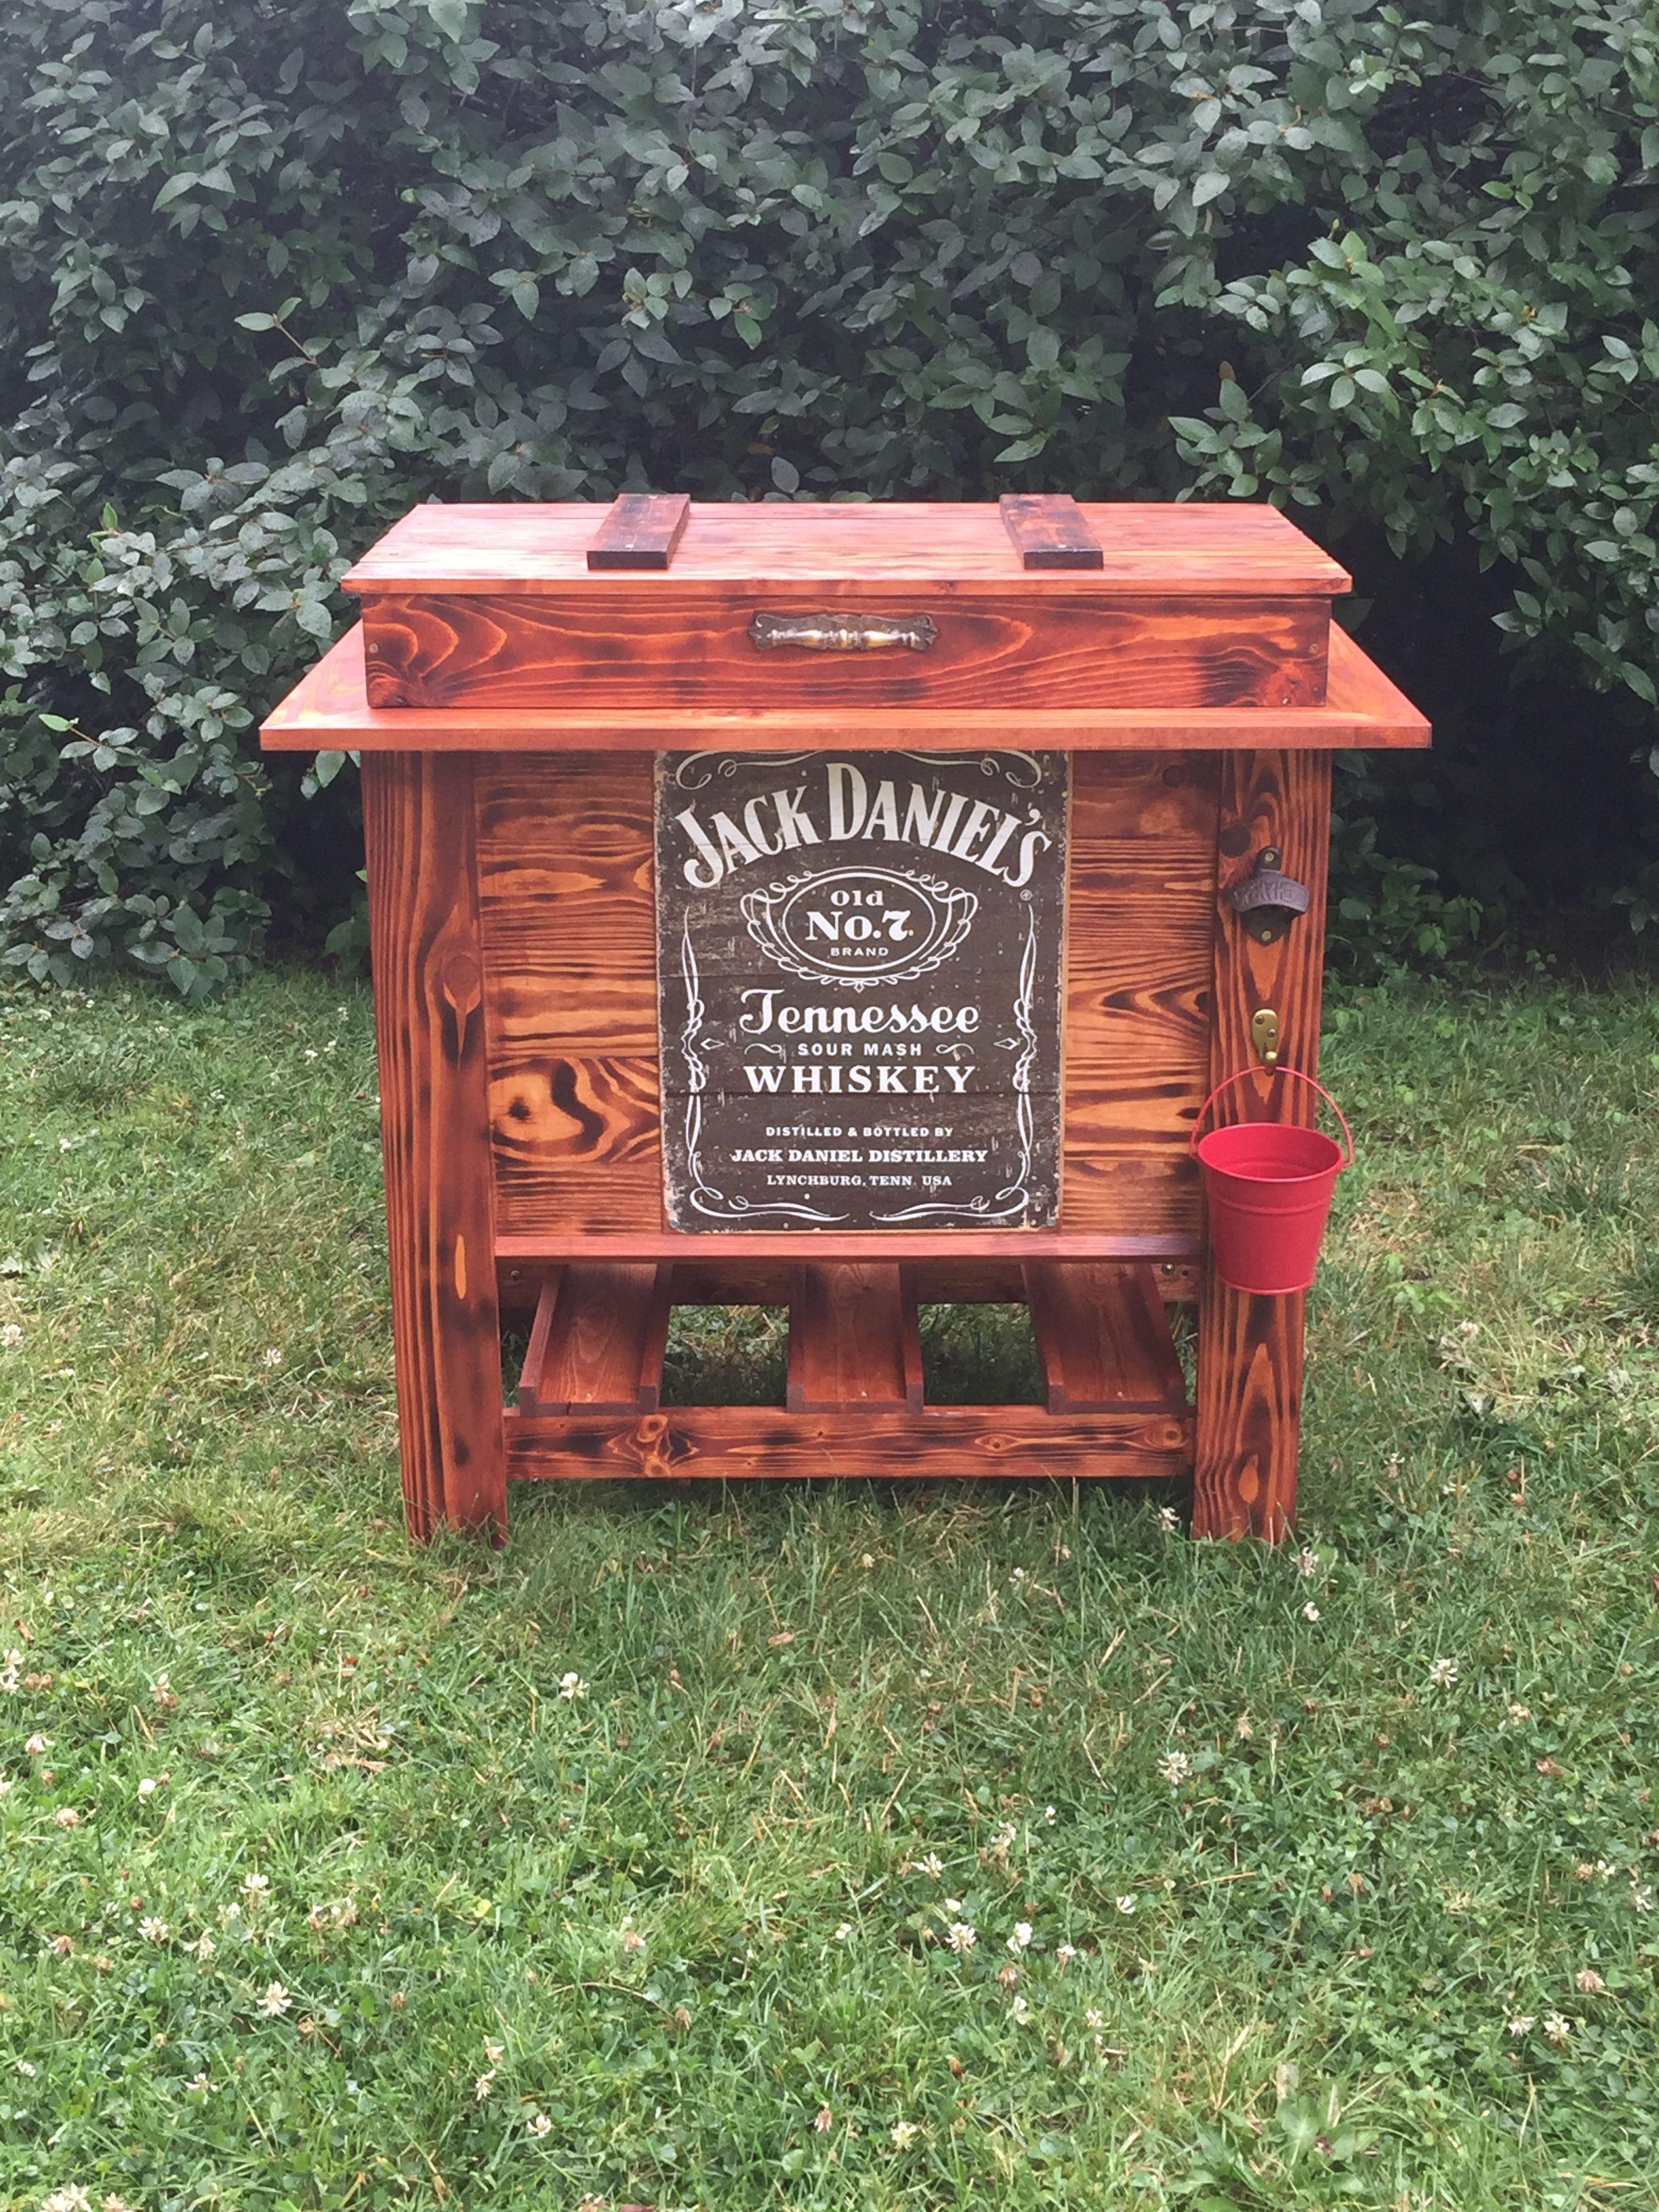 Wood Patio Cooler Plans: DIY Wooden Cooler Jack Daniels (check Us Out!)